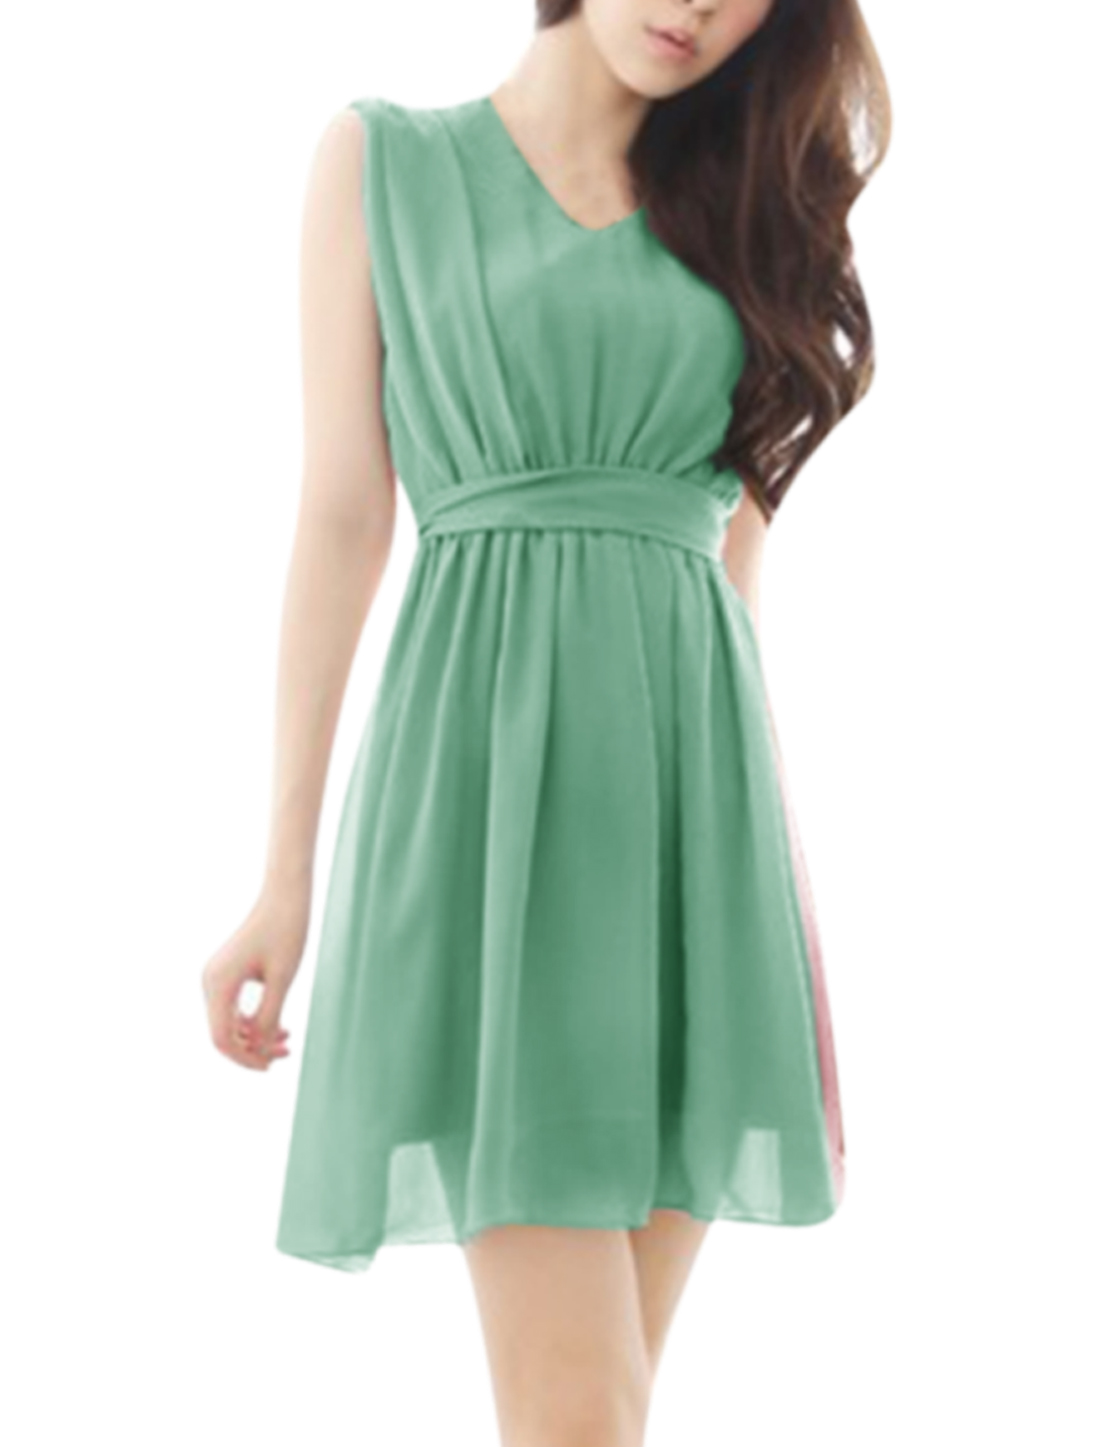 Women V Neck Sleeveless Elastic Waist Design Chiffon Dress Beige Mint S